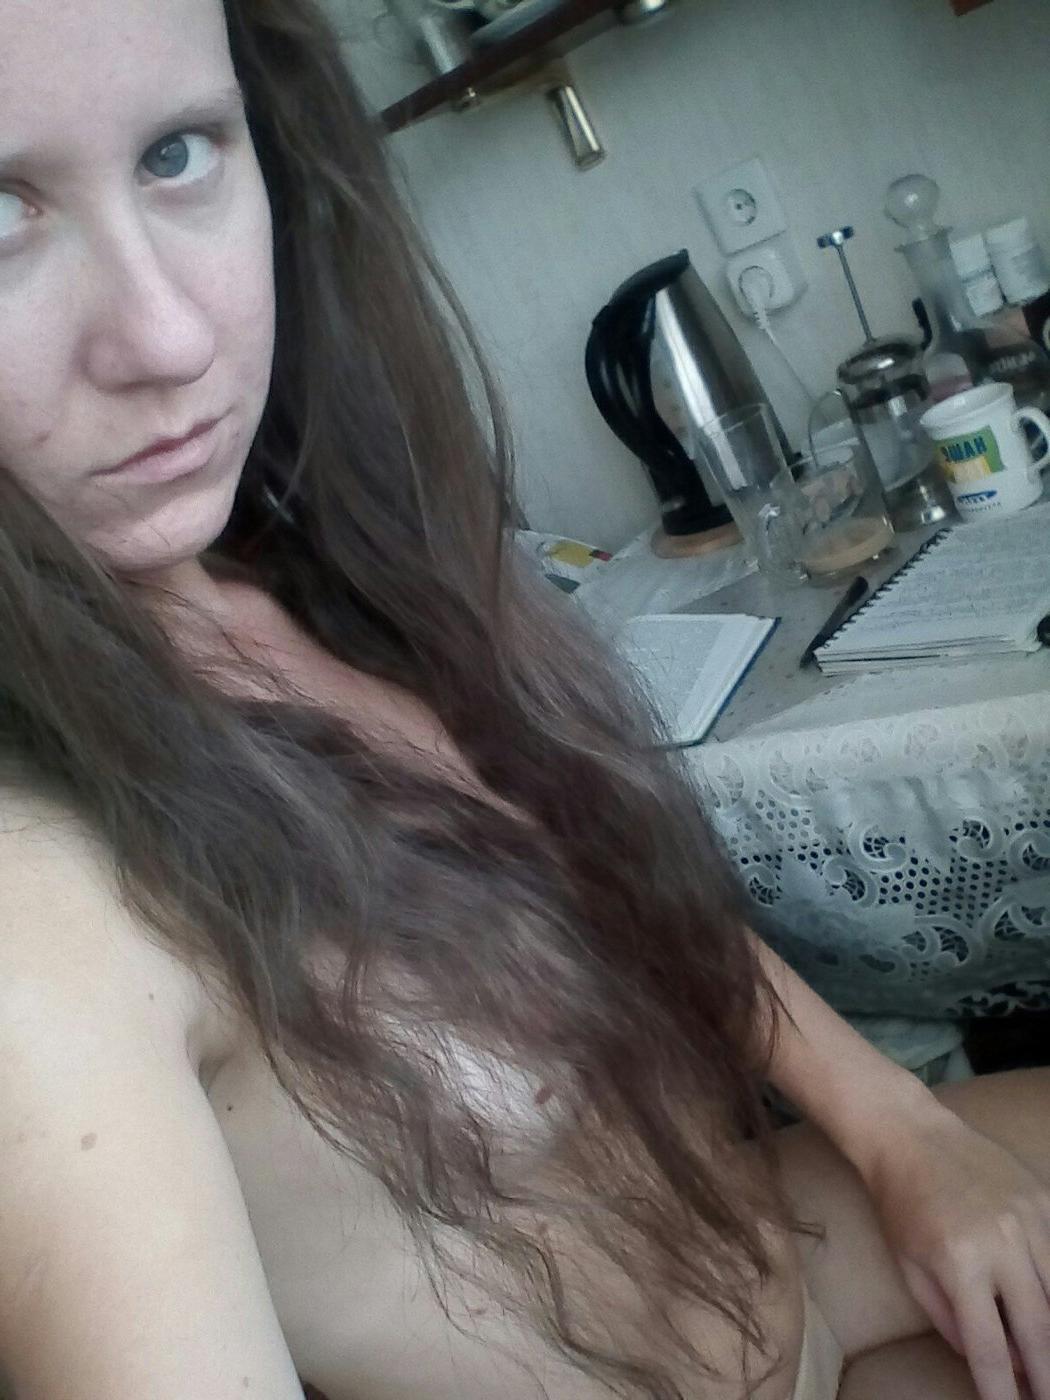 Индивидуалка Подружки Девче, 34 года, метро Новопеределкино